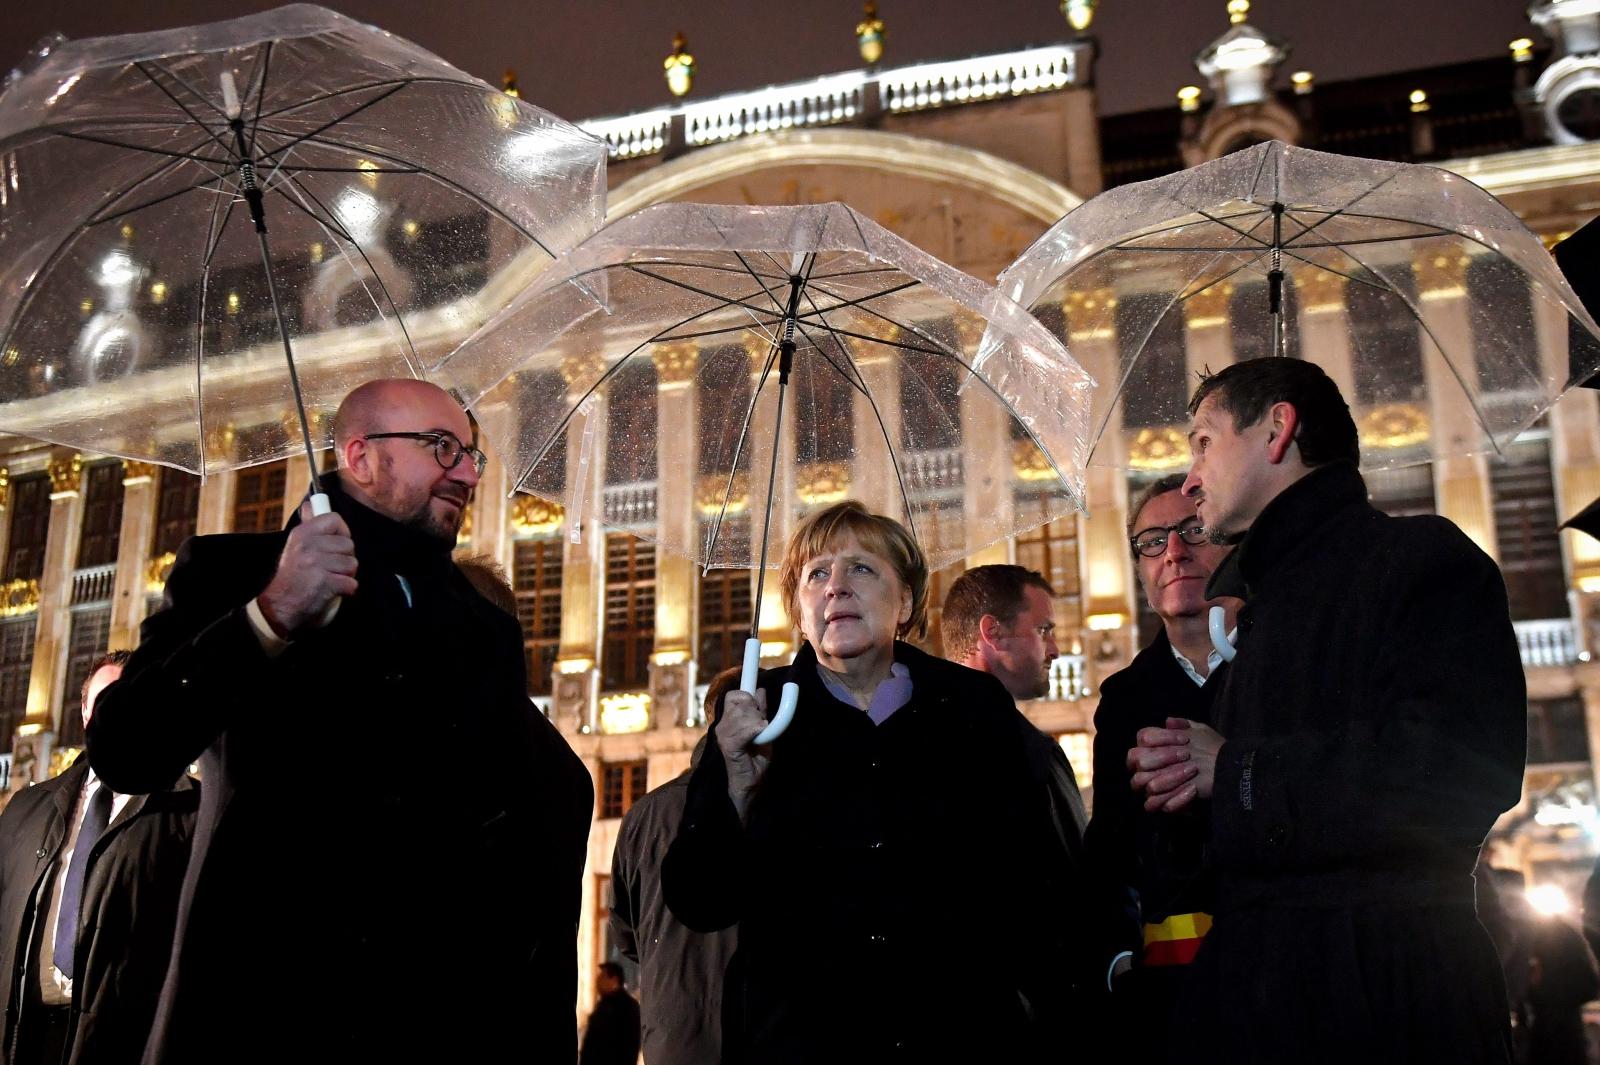 Wizyta Angeli Merkel w Belgii. Fot. PAP/EPA/DAVID STOCKMAN / POOL BELGIUM OUT